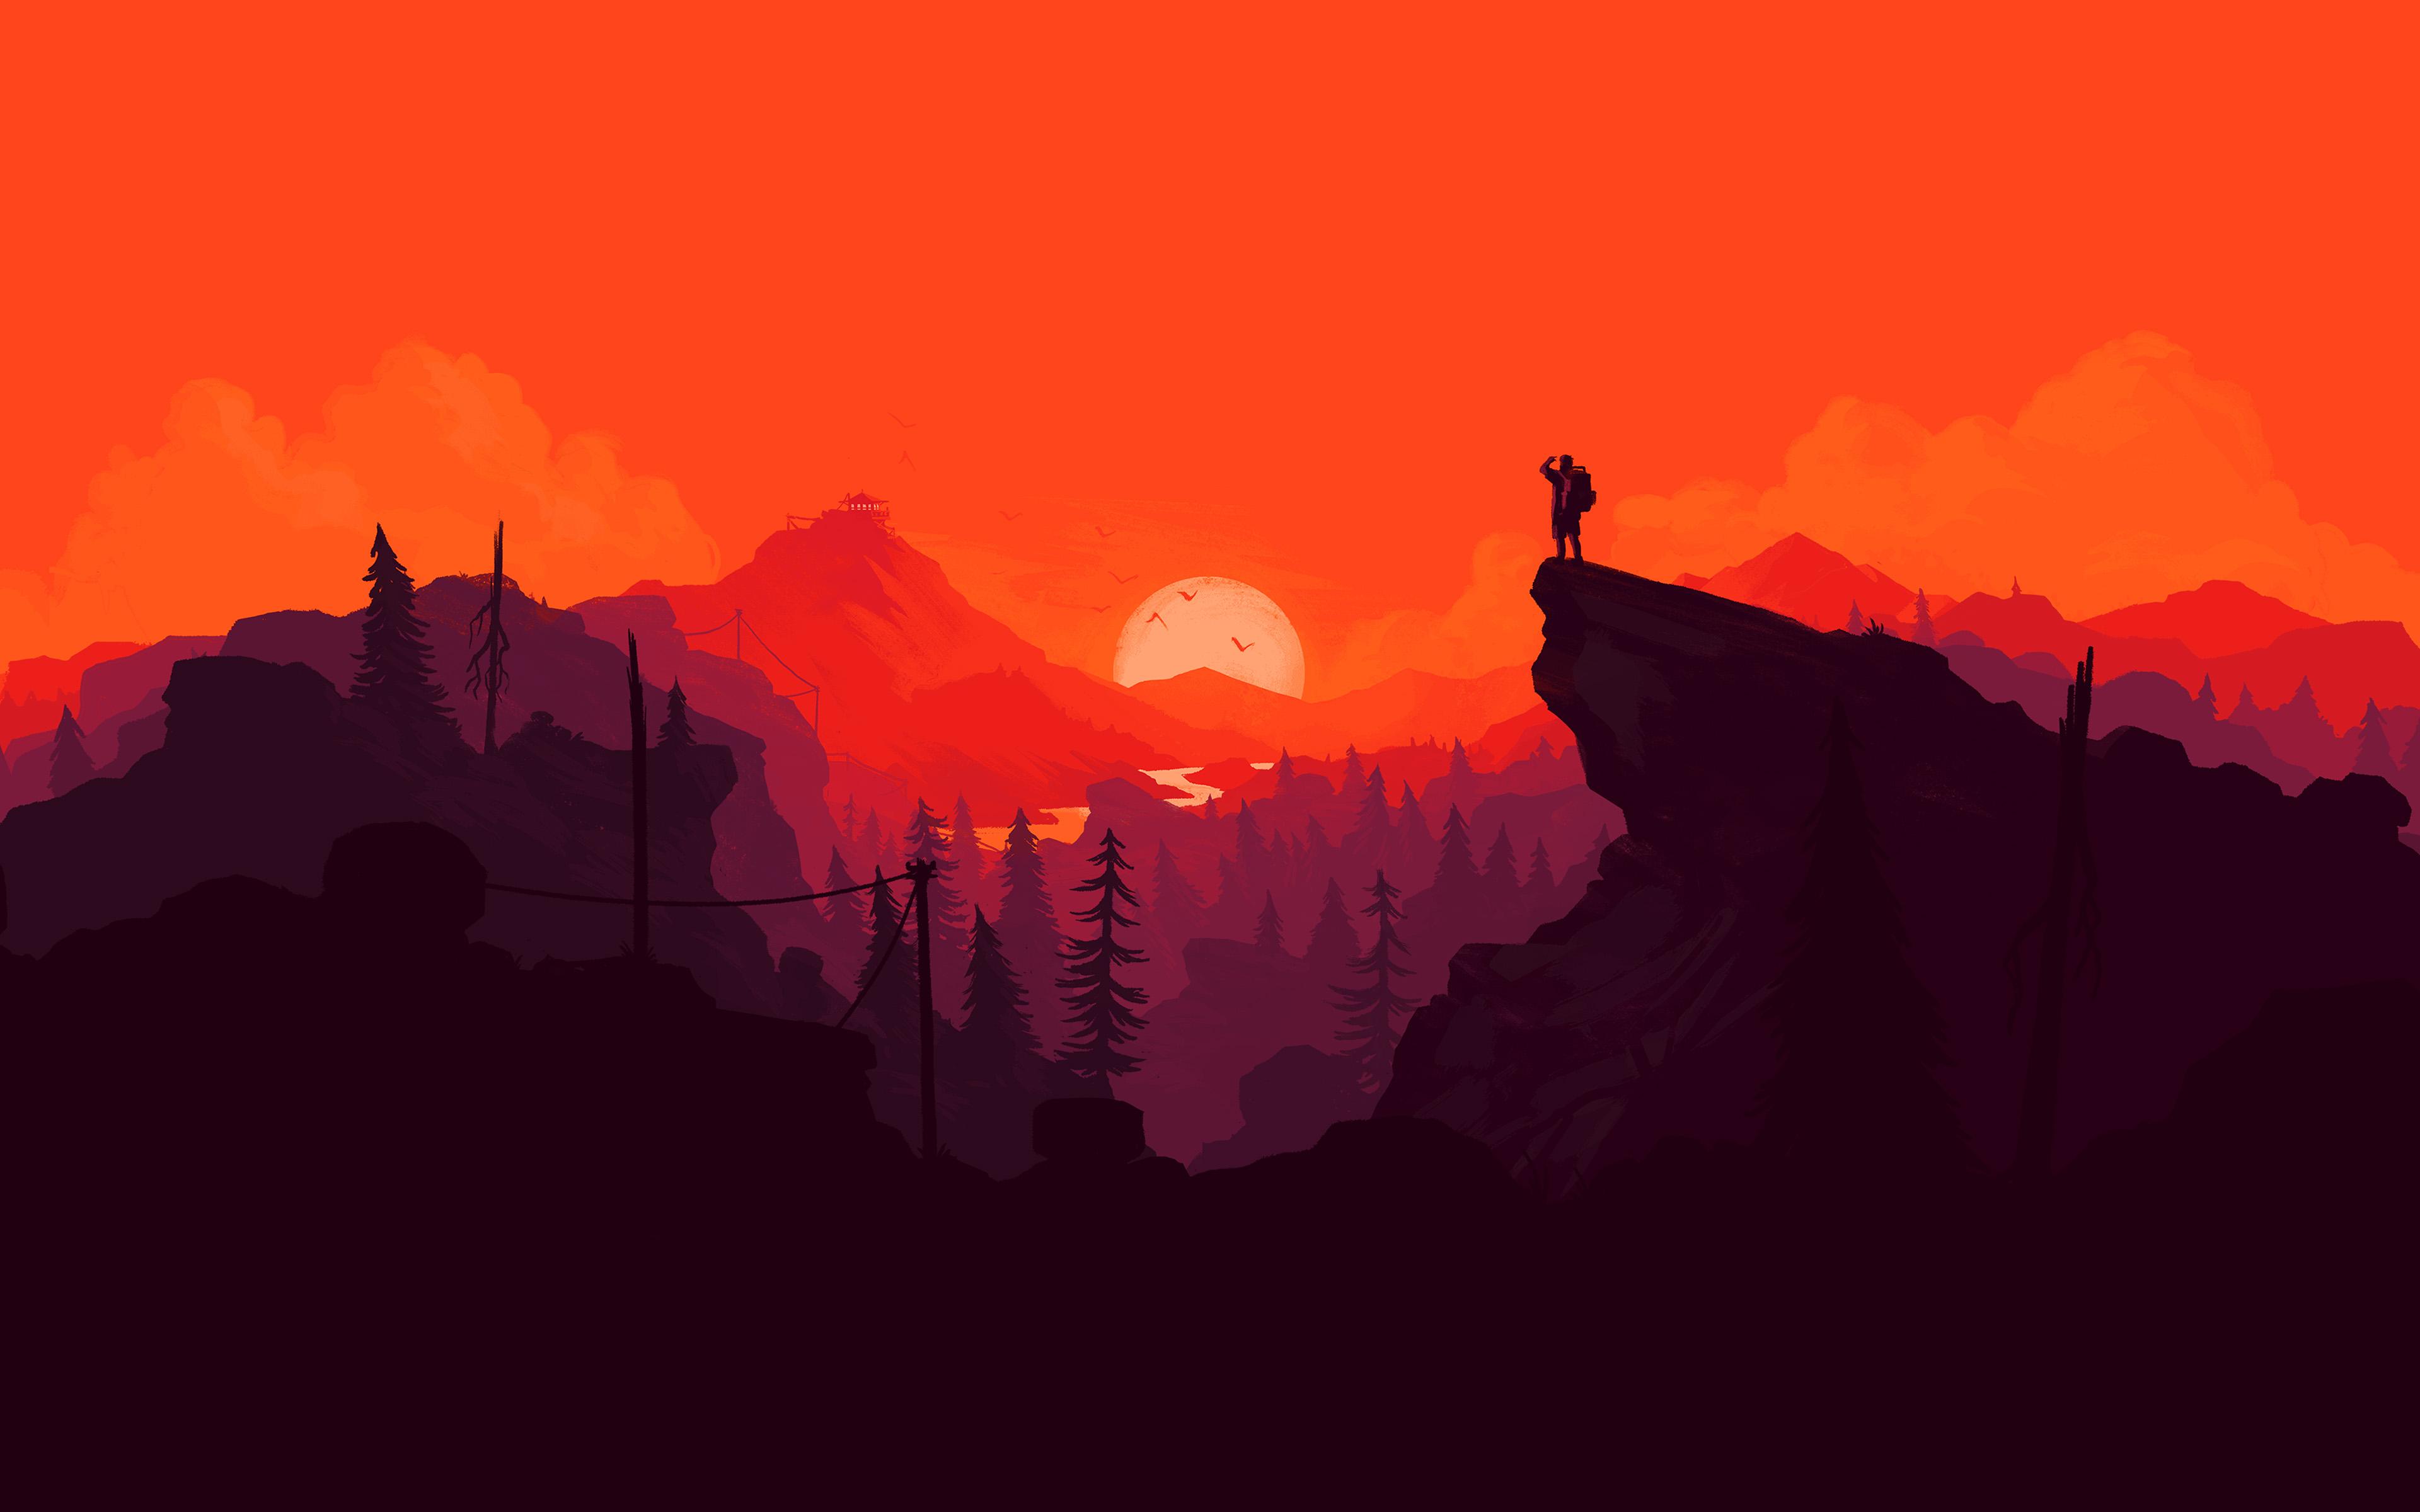 General 3840x2400 illustration landscape digital art mountains Firewatch video games nature artwork minimalism hiking sunset simple background orange painting